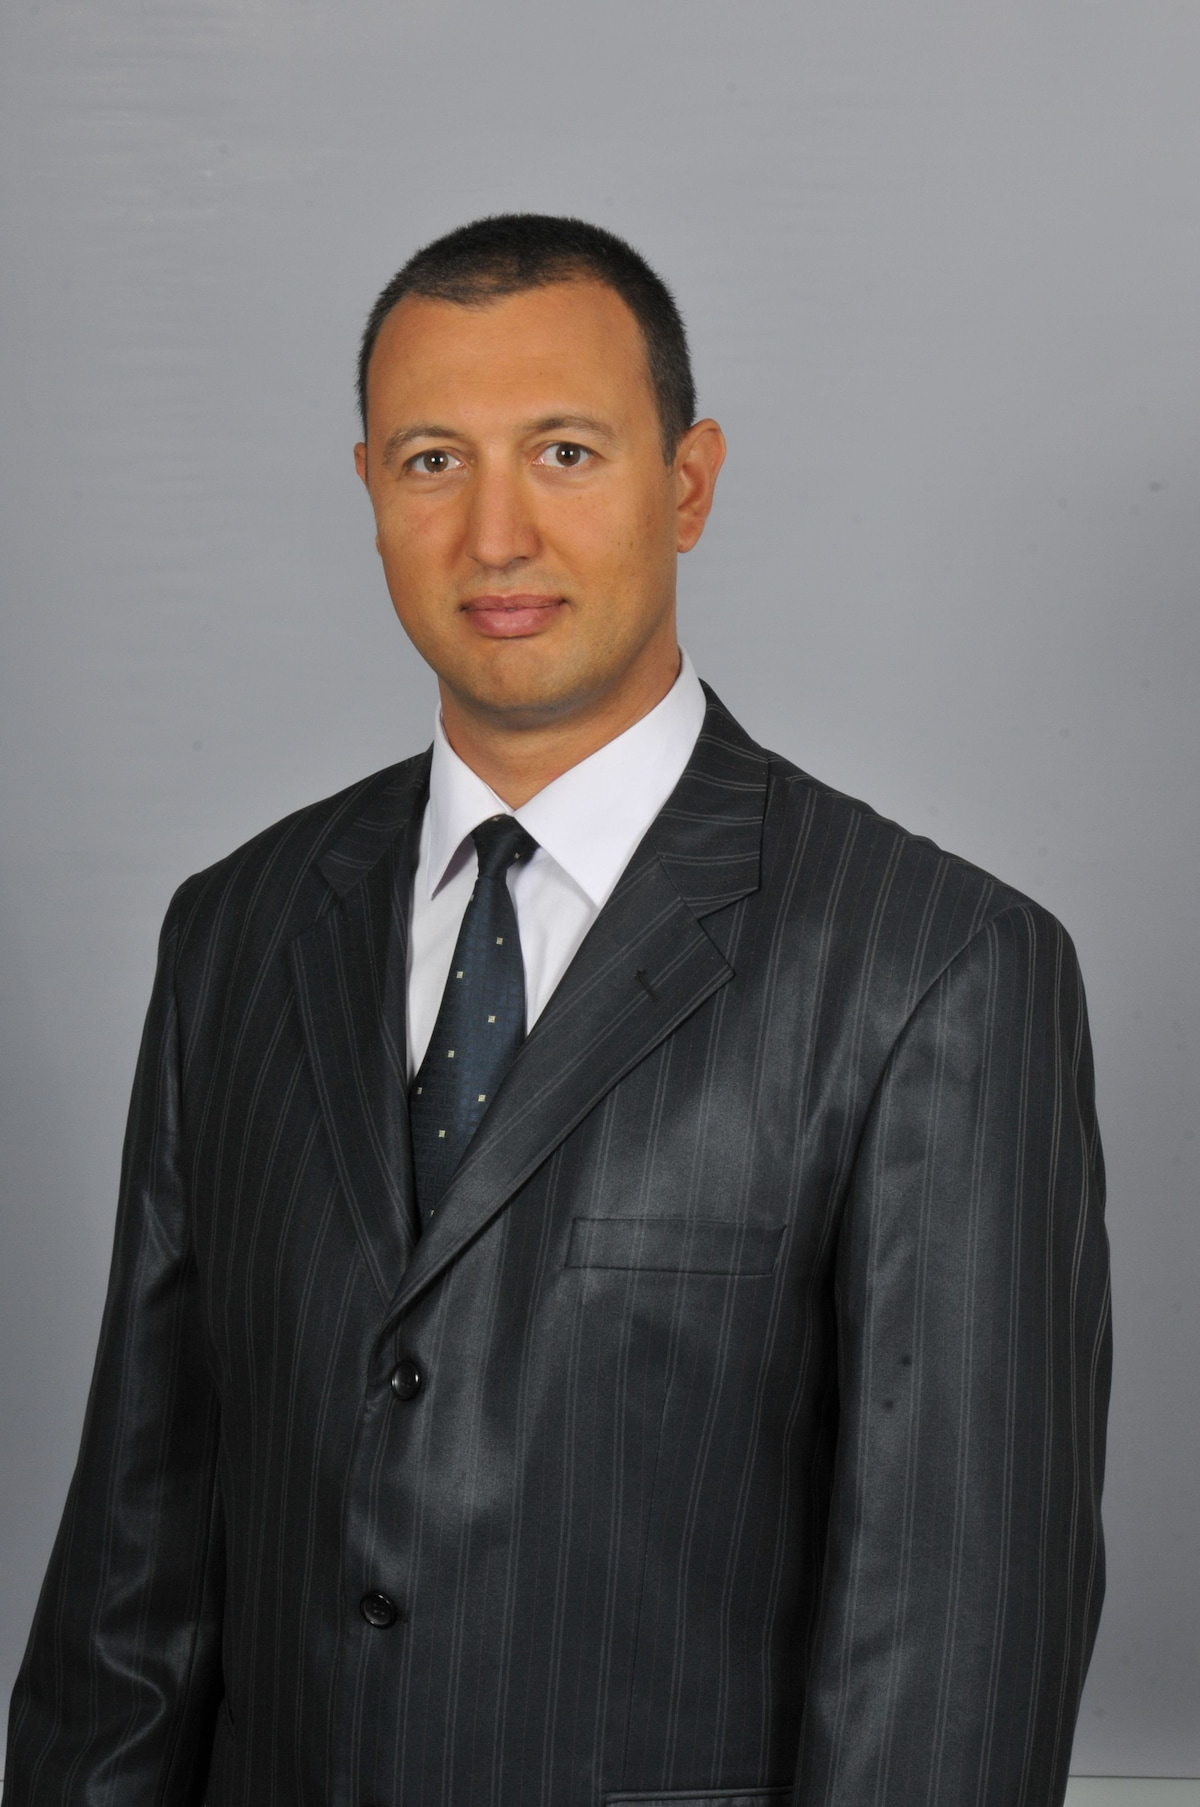 Rafi From Sozopol, Bulgaria